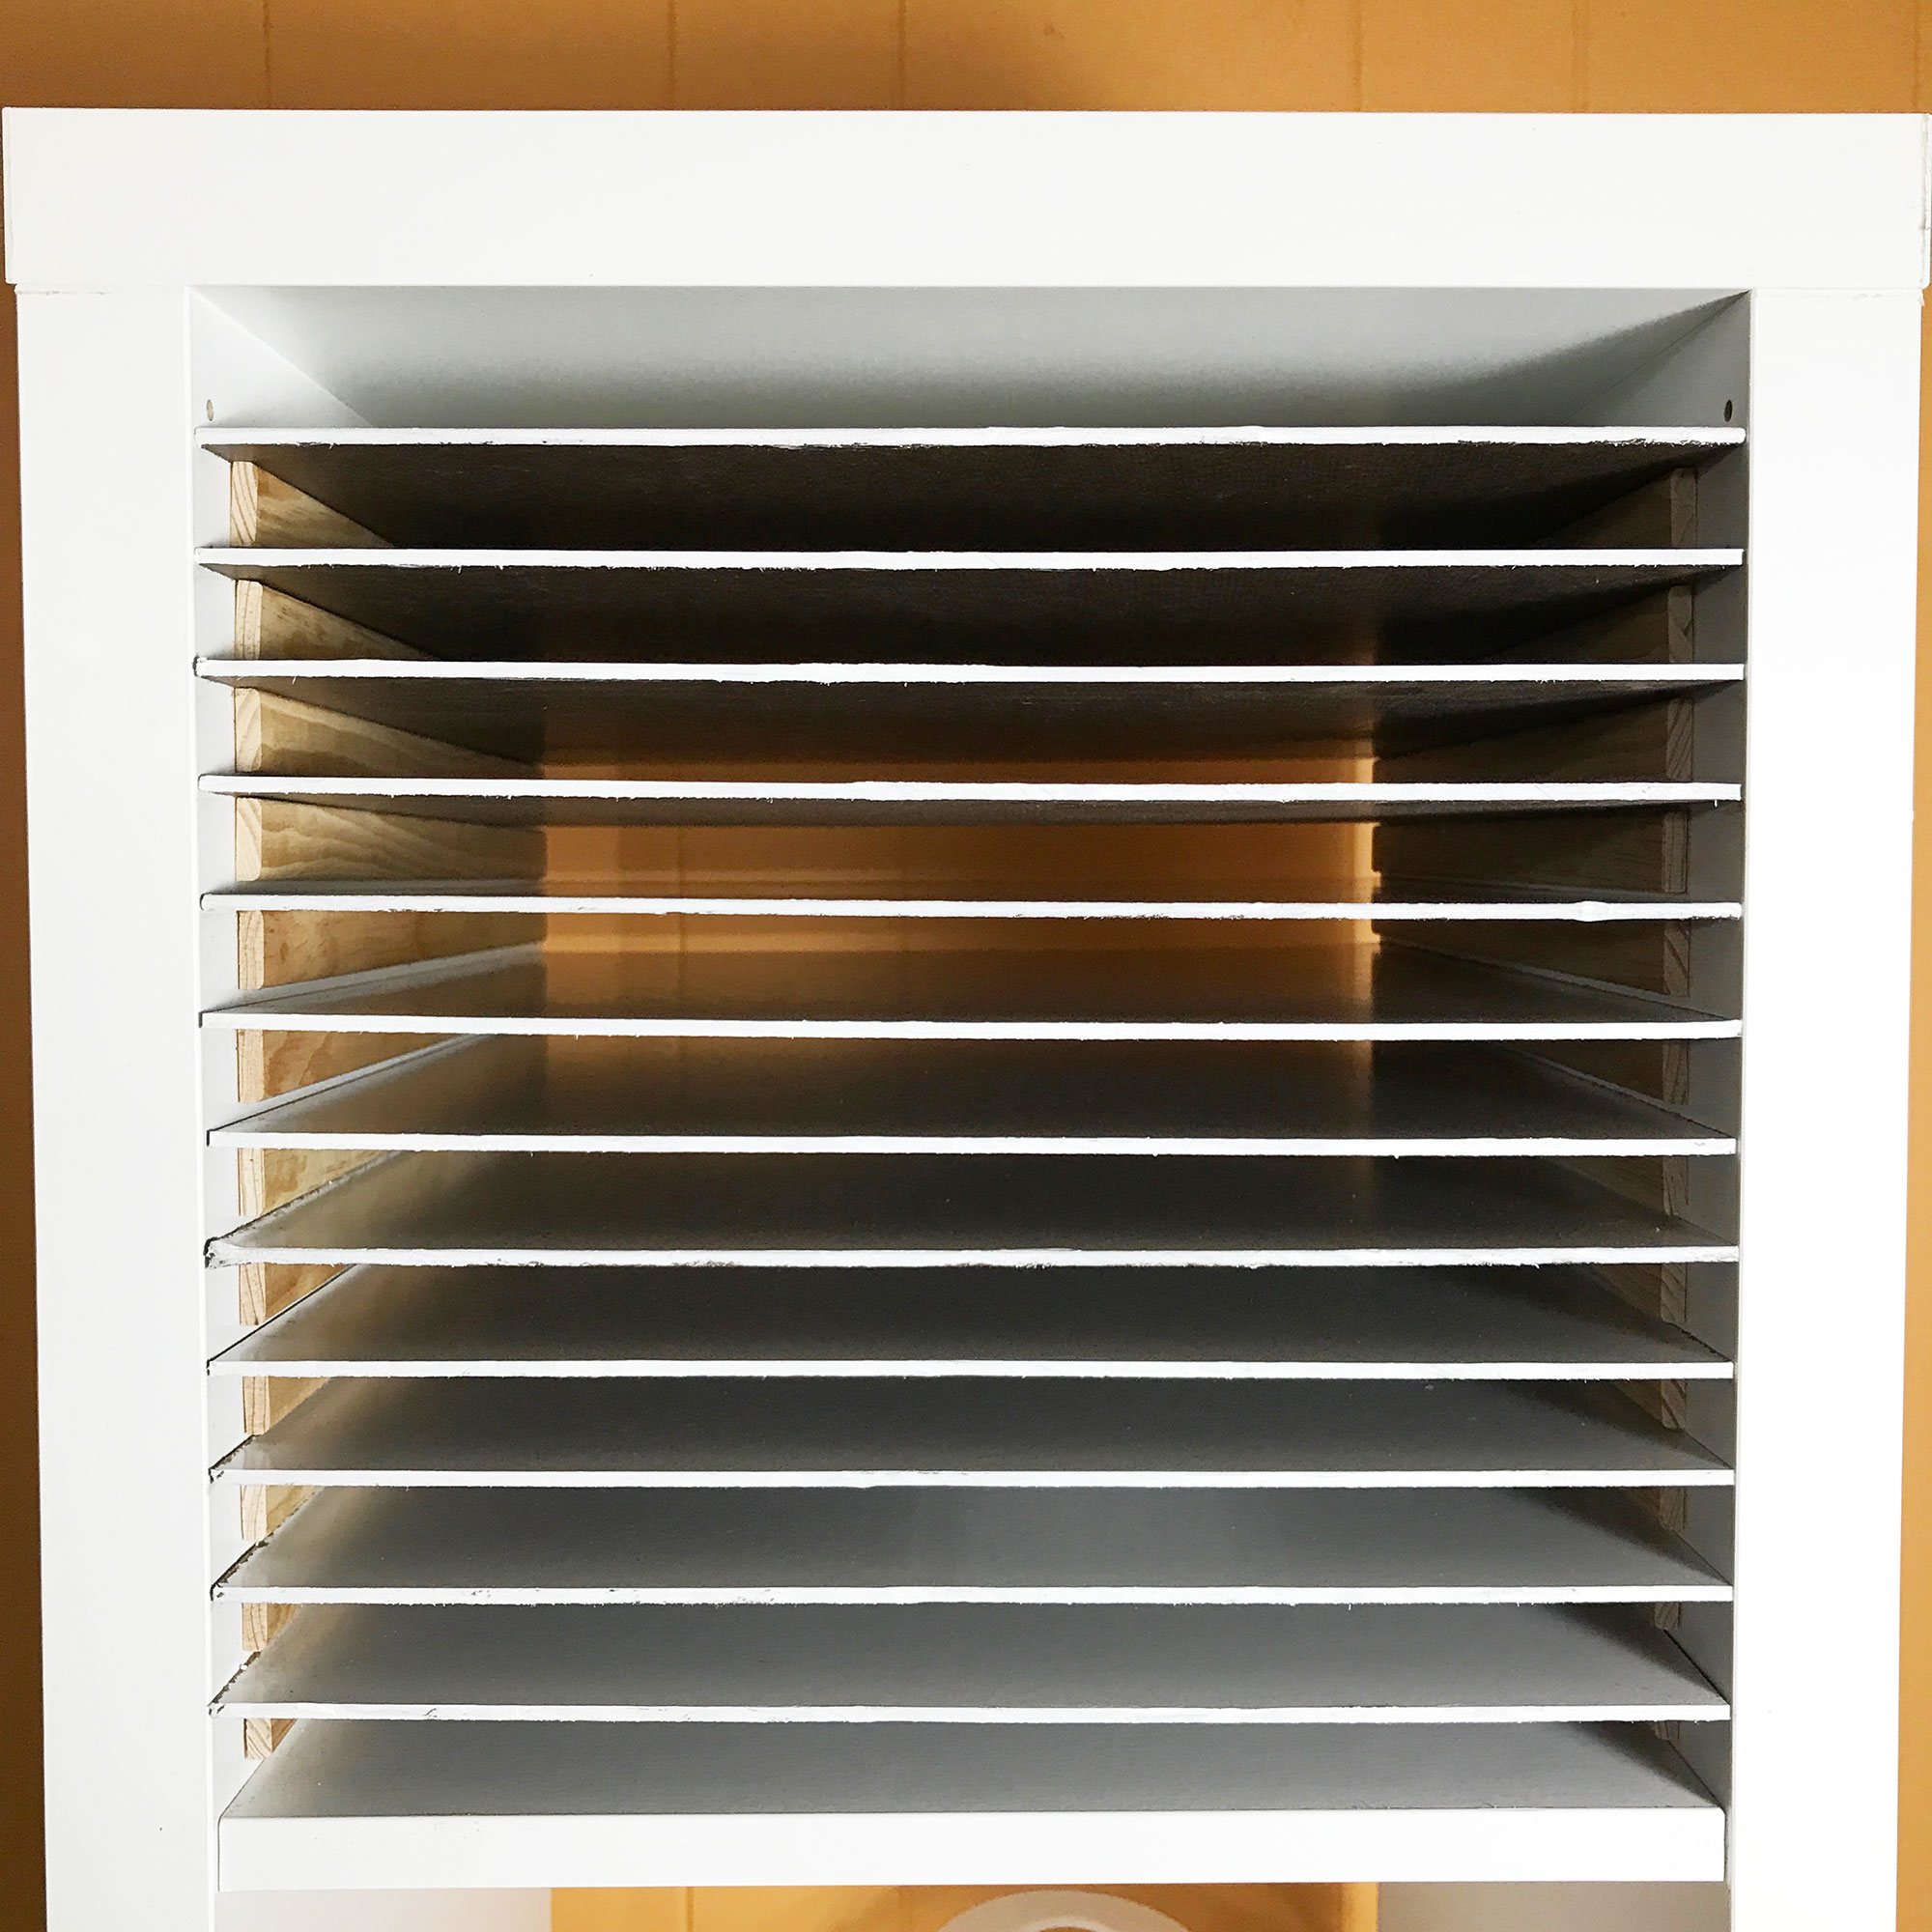 12x12 Scrapbook Paper Storage Organizer Shelves Done Jennifer Maker